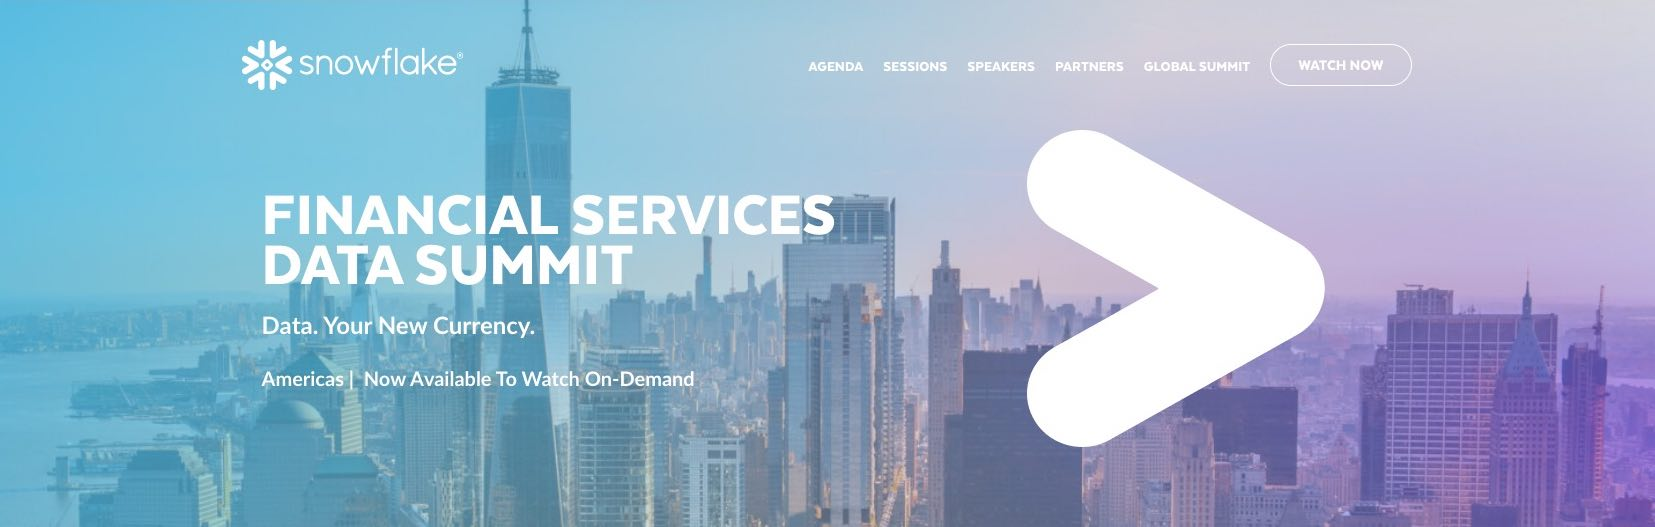 Snowflake Financial Services Data Summit